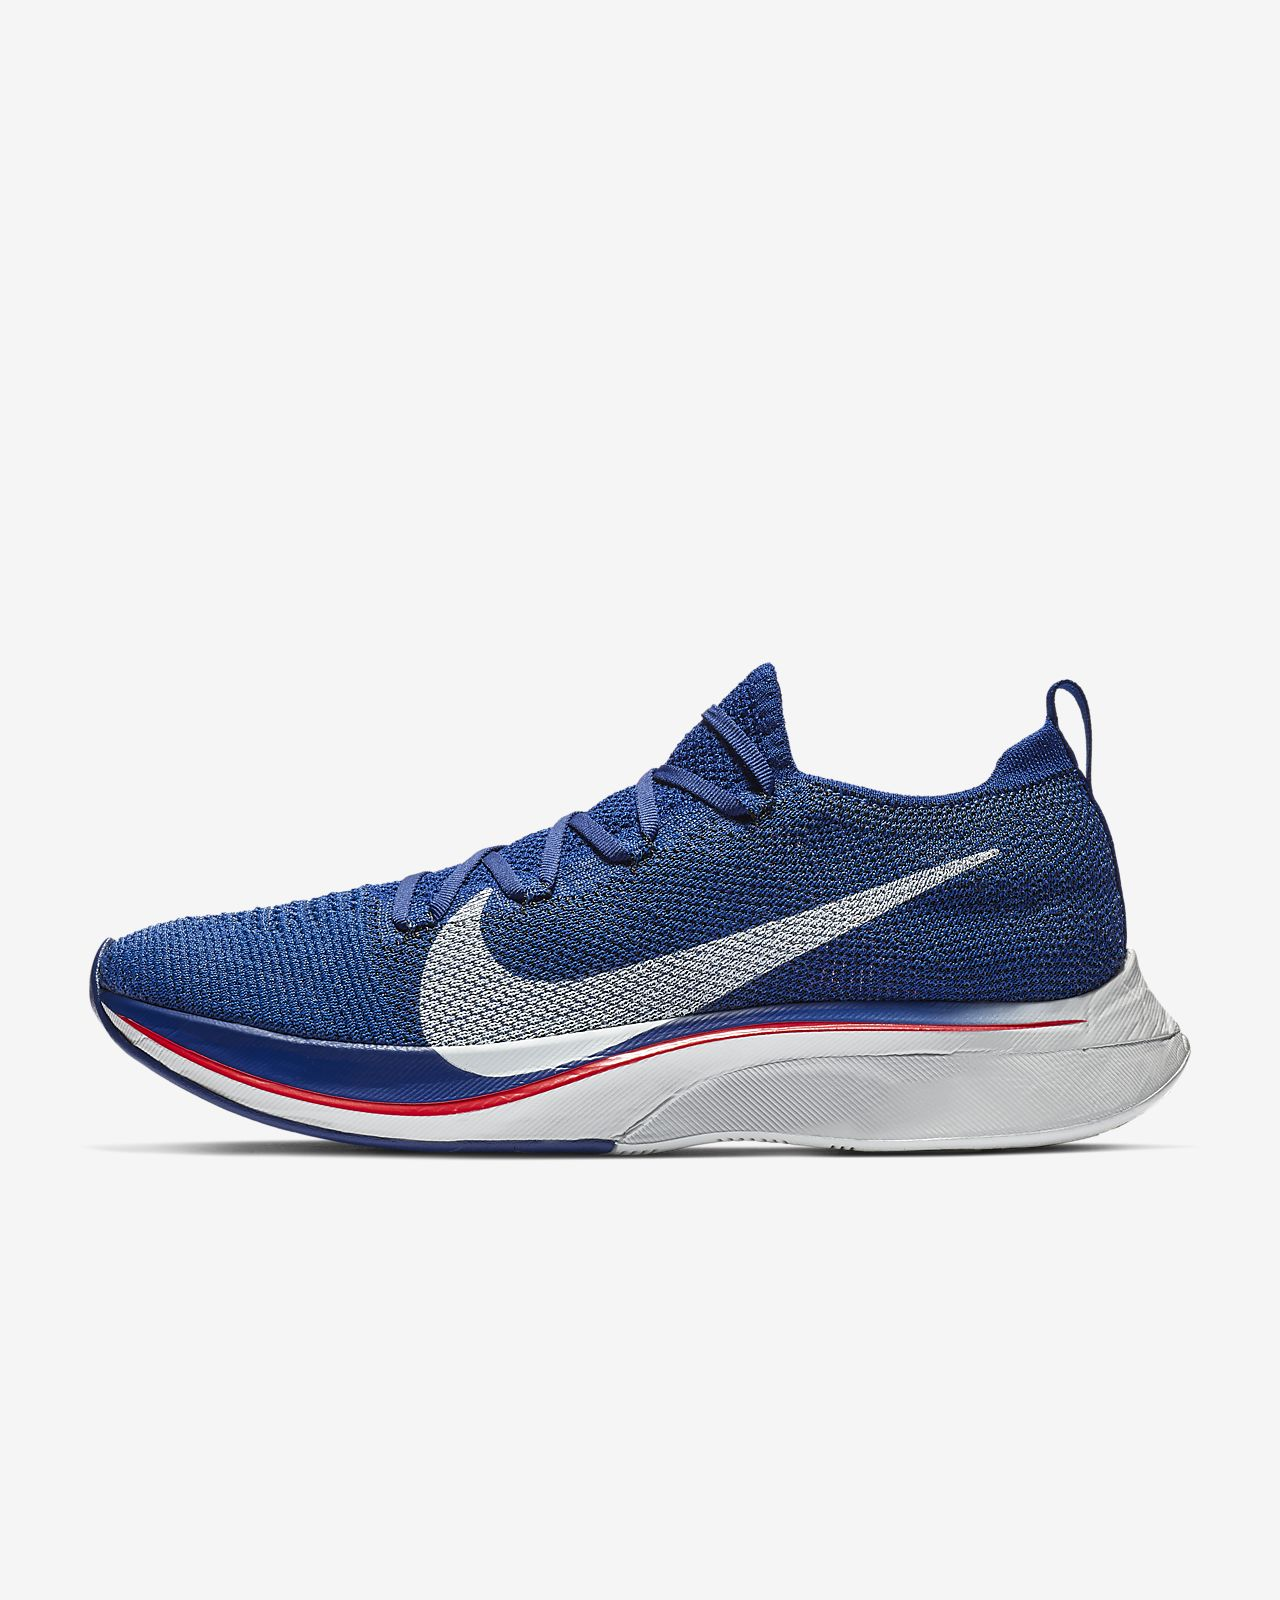 Nike VaporFly 4% Flyknit Unisex Running Shoe